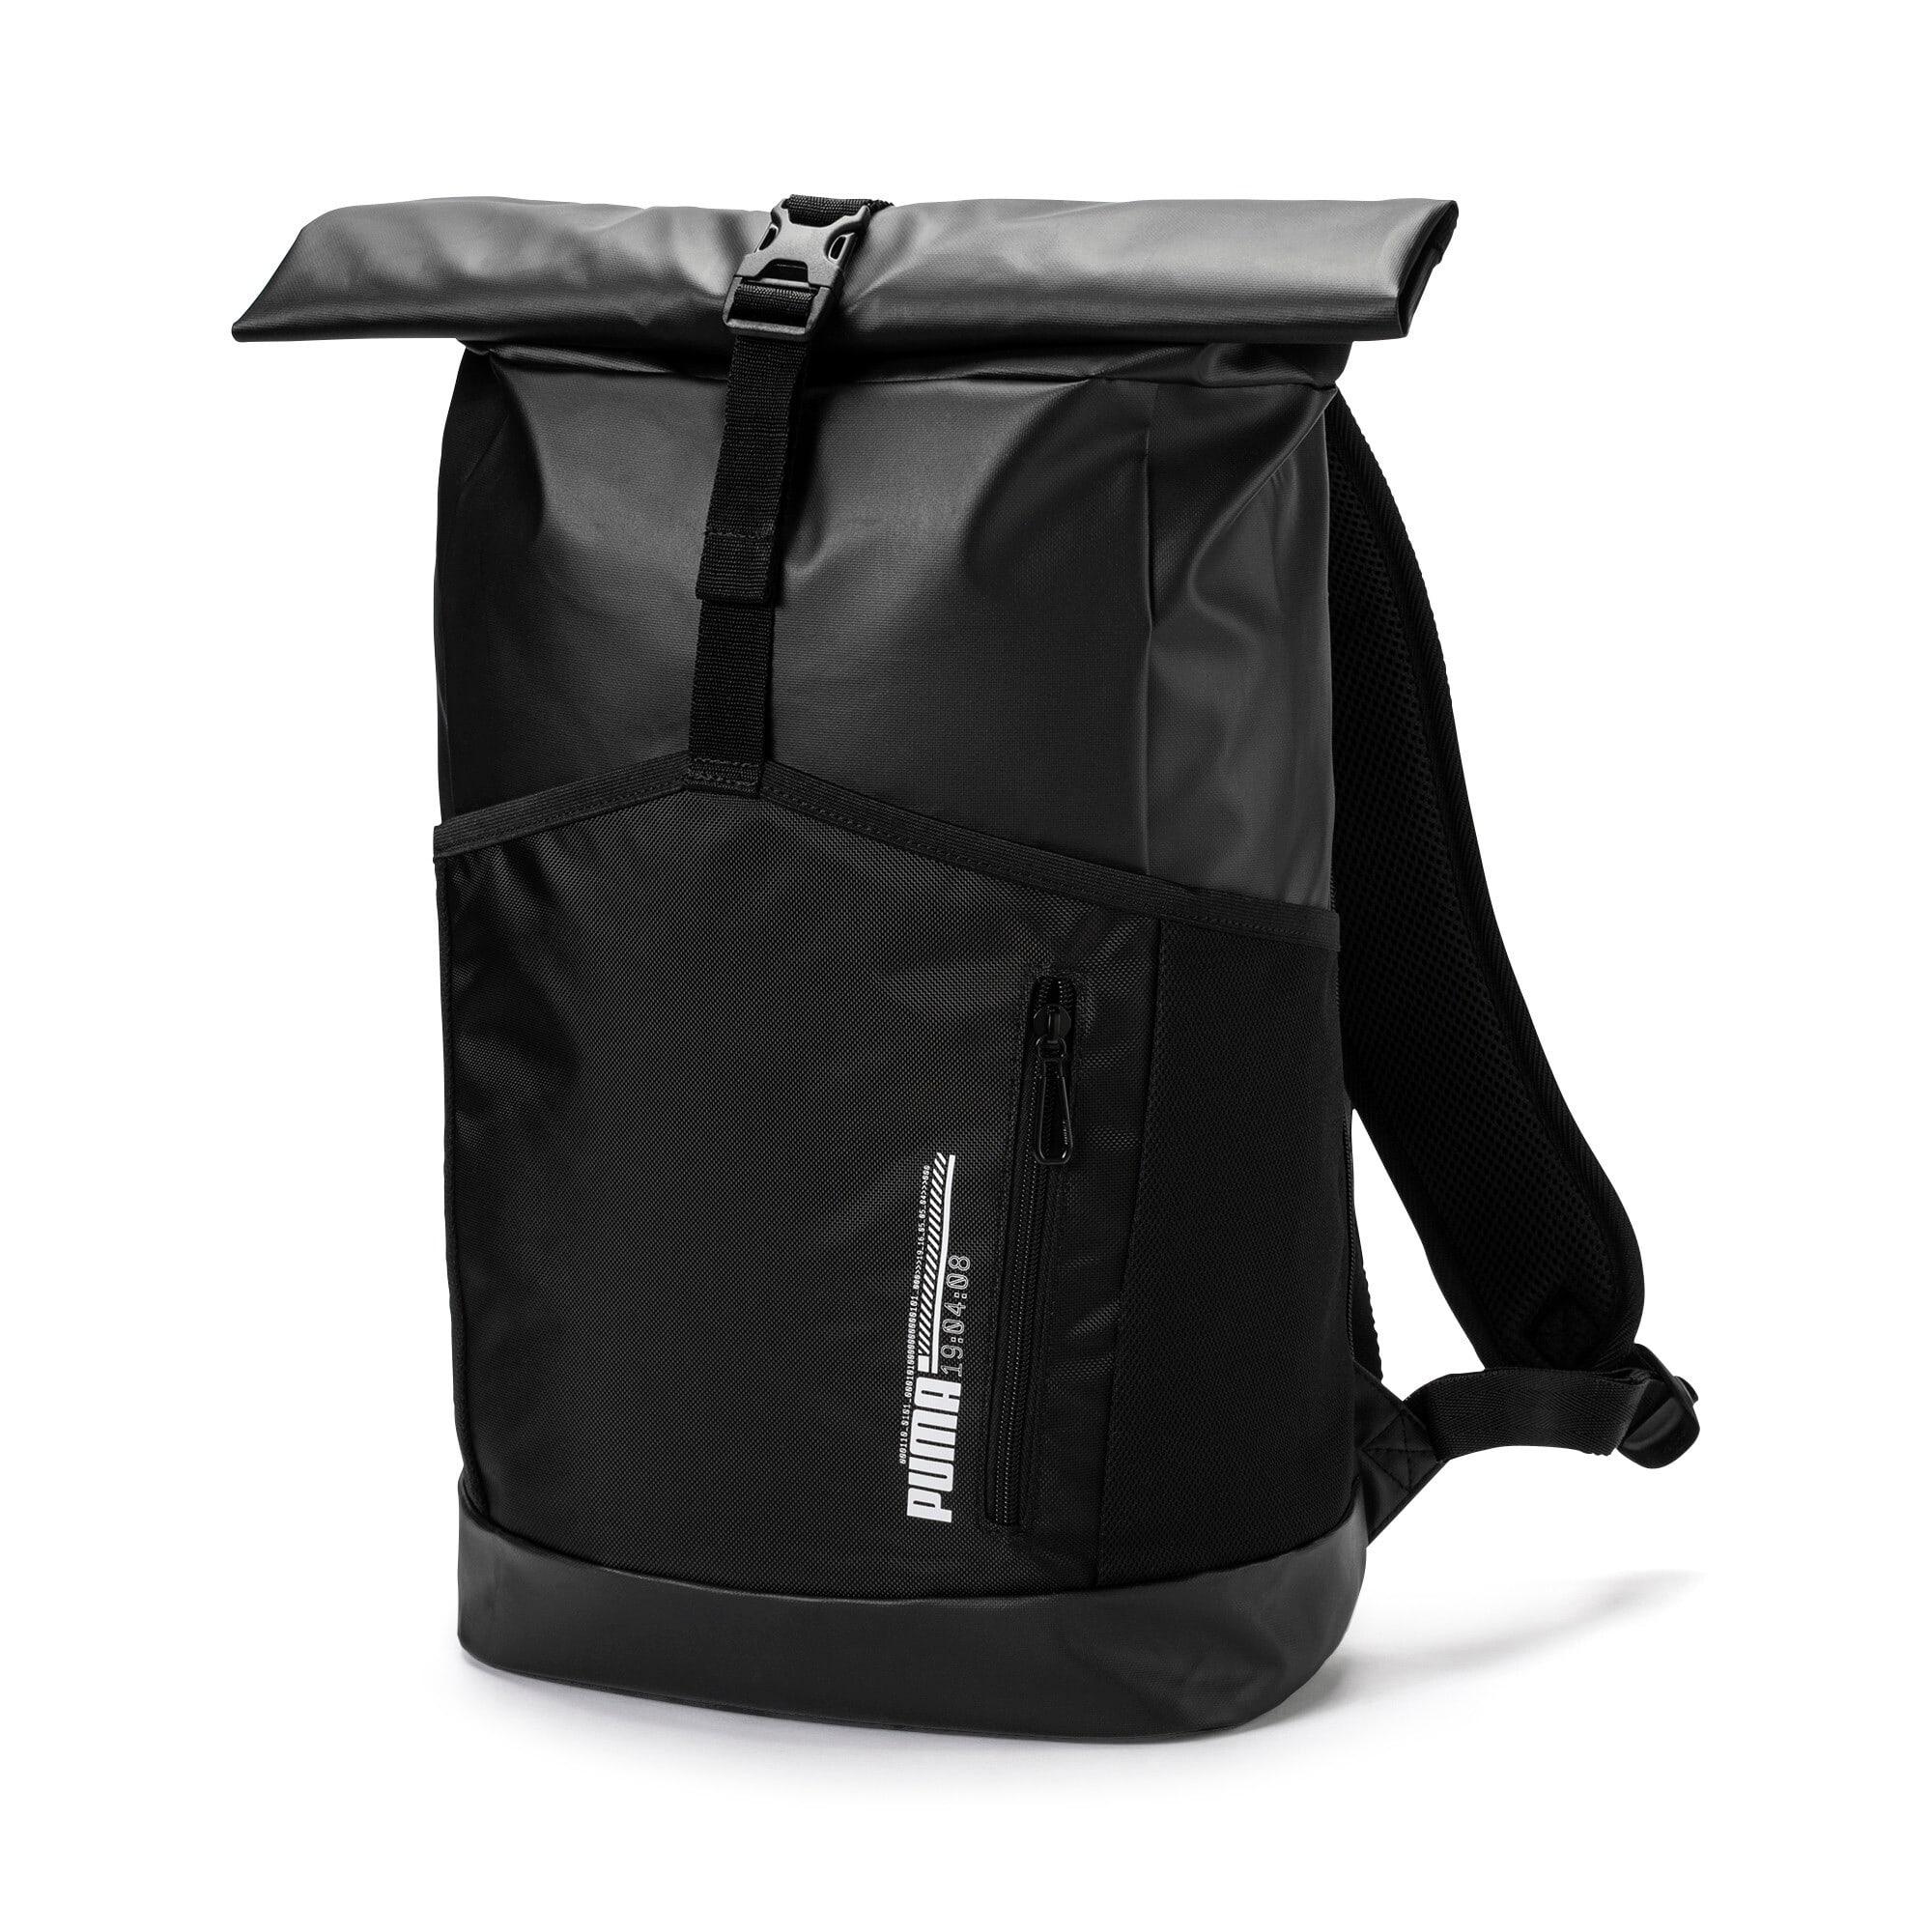 Thumbnail 1 of Energy Rolltop Backpack, Puma Black, medium